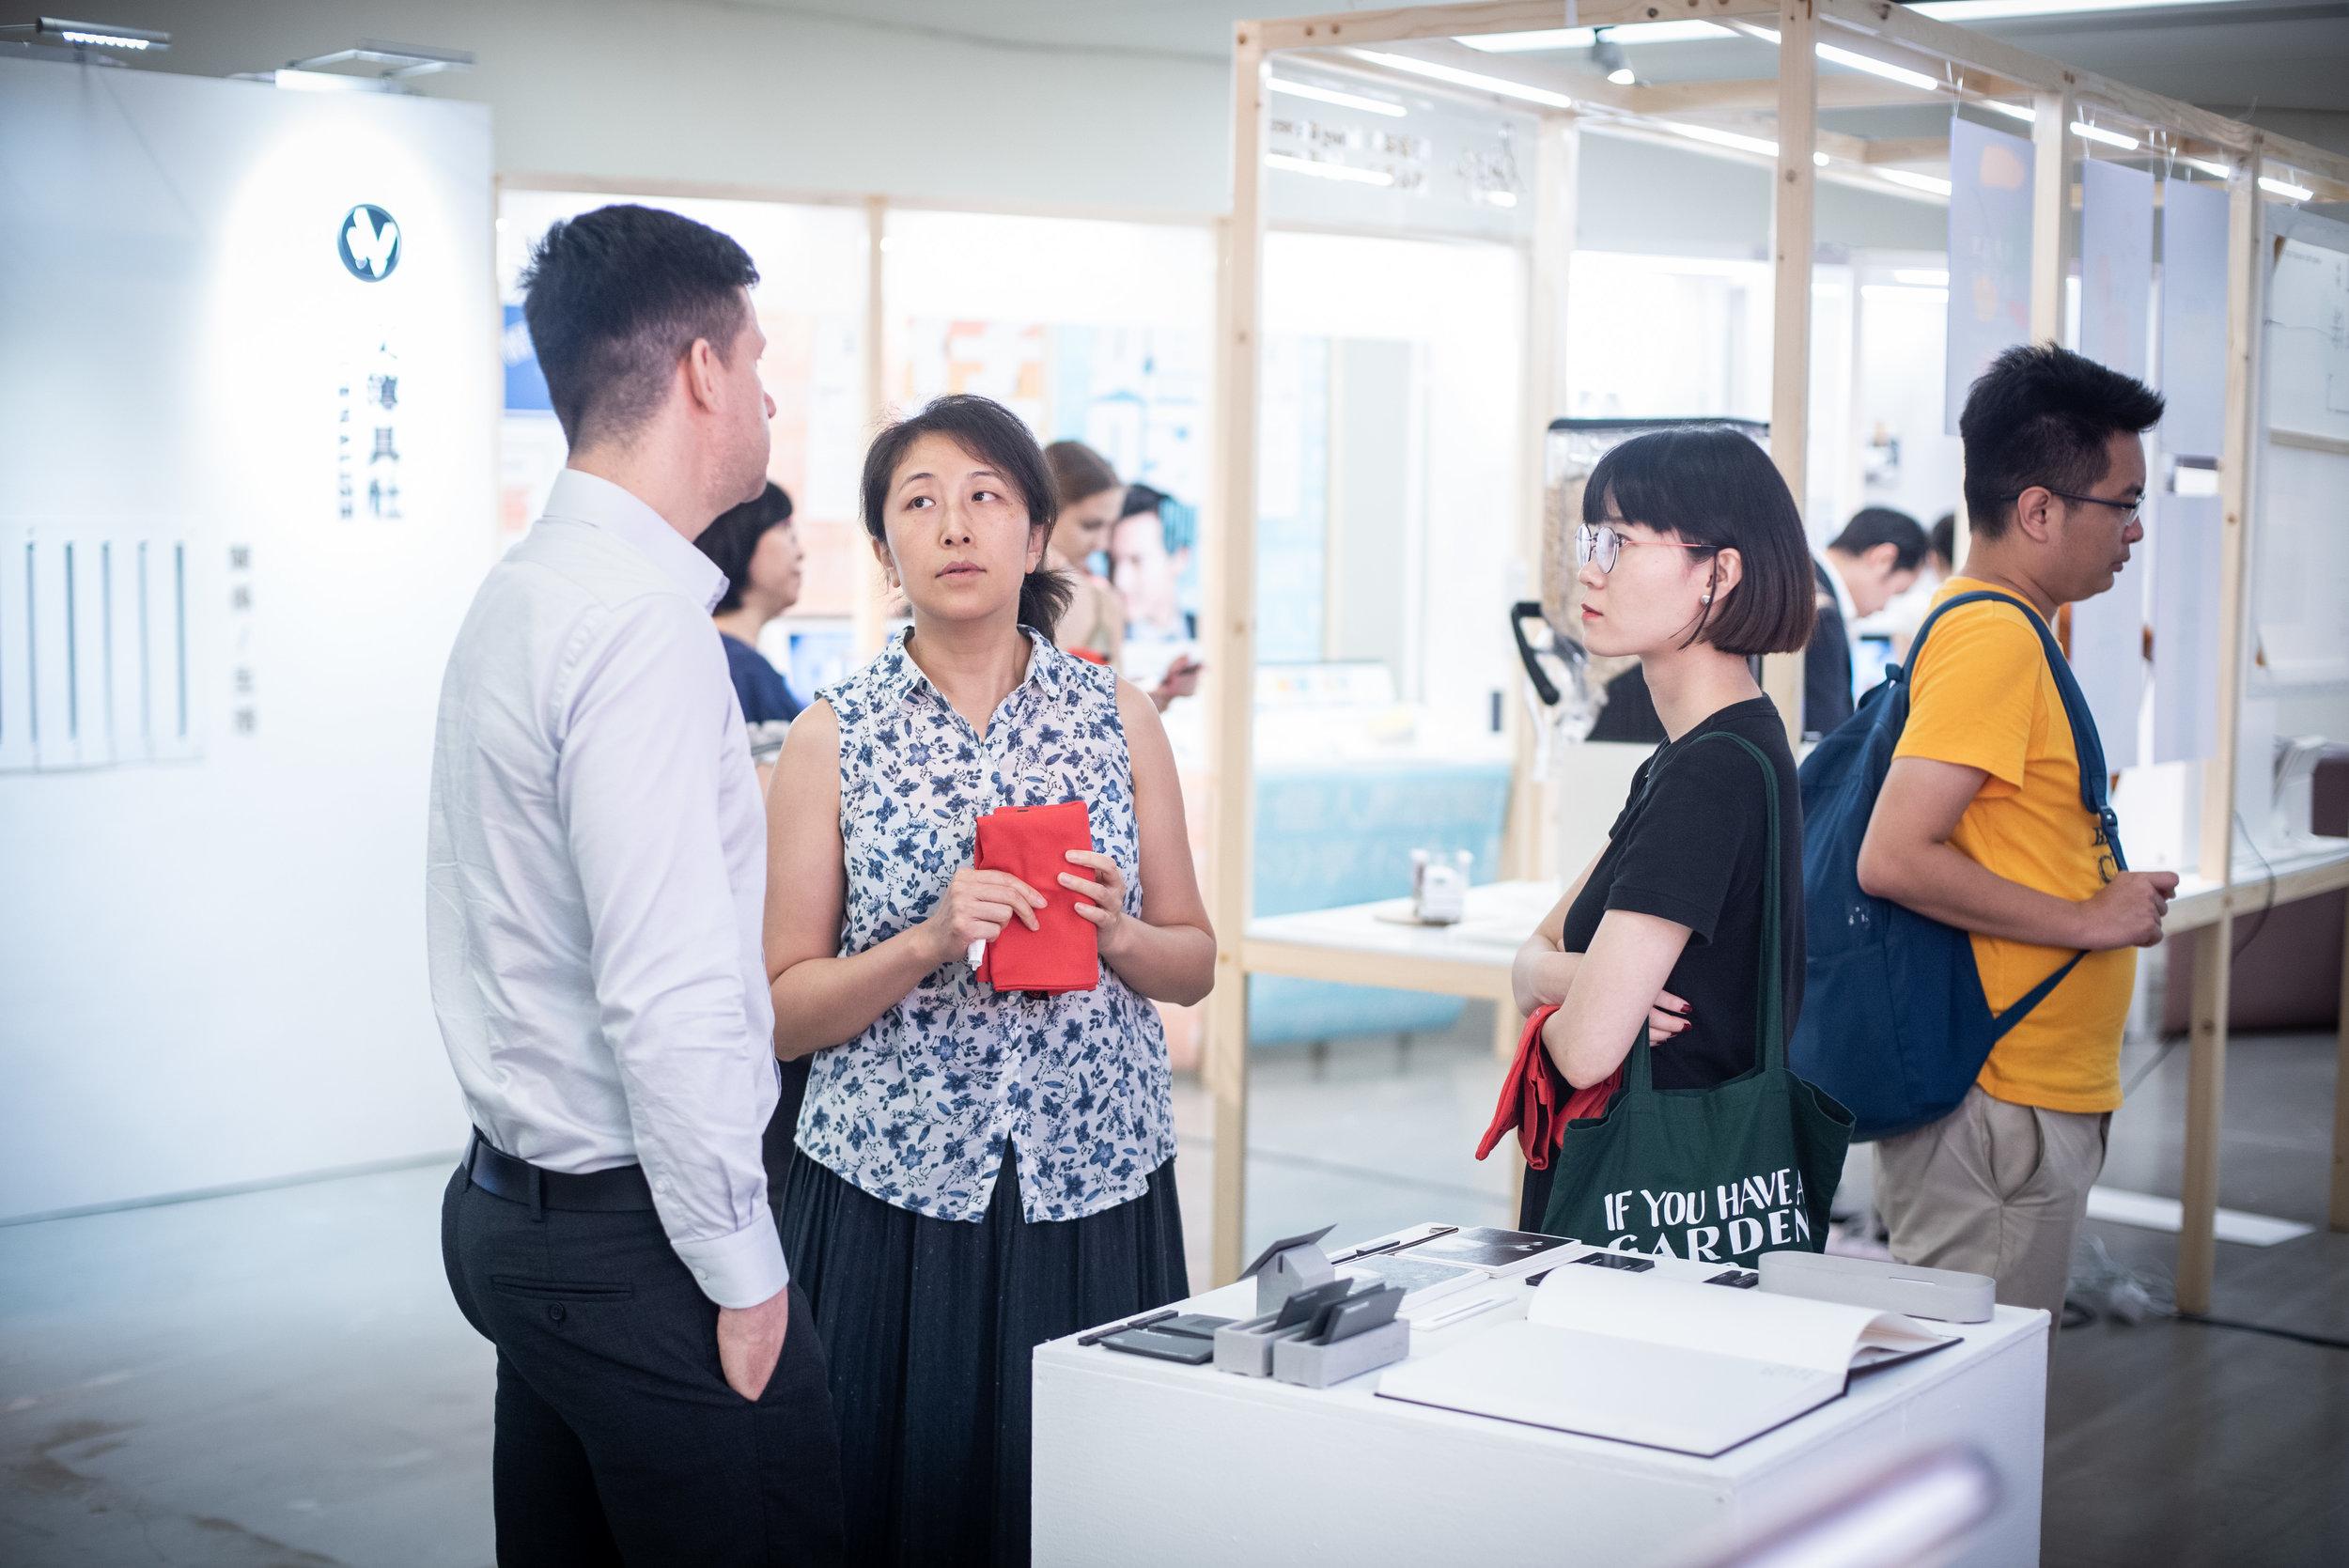 20190619 Poly U design school opening (196 of 219).jpg